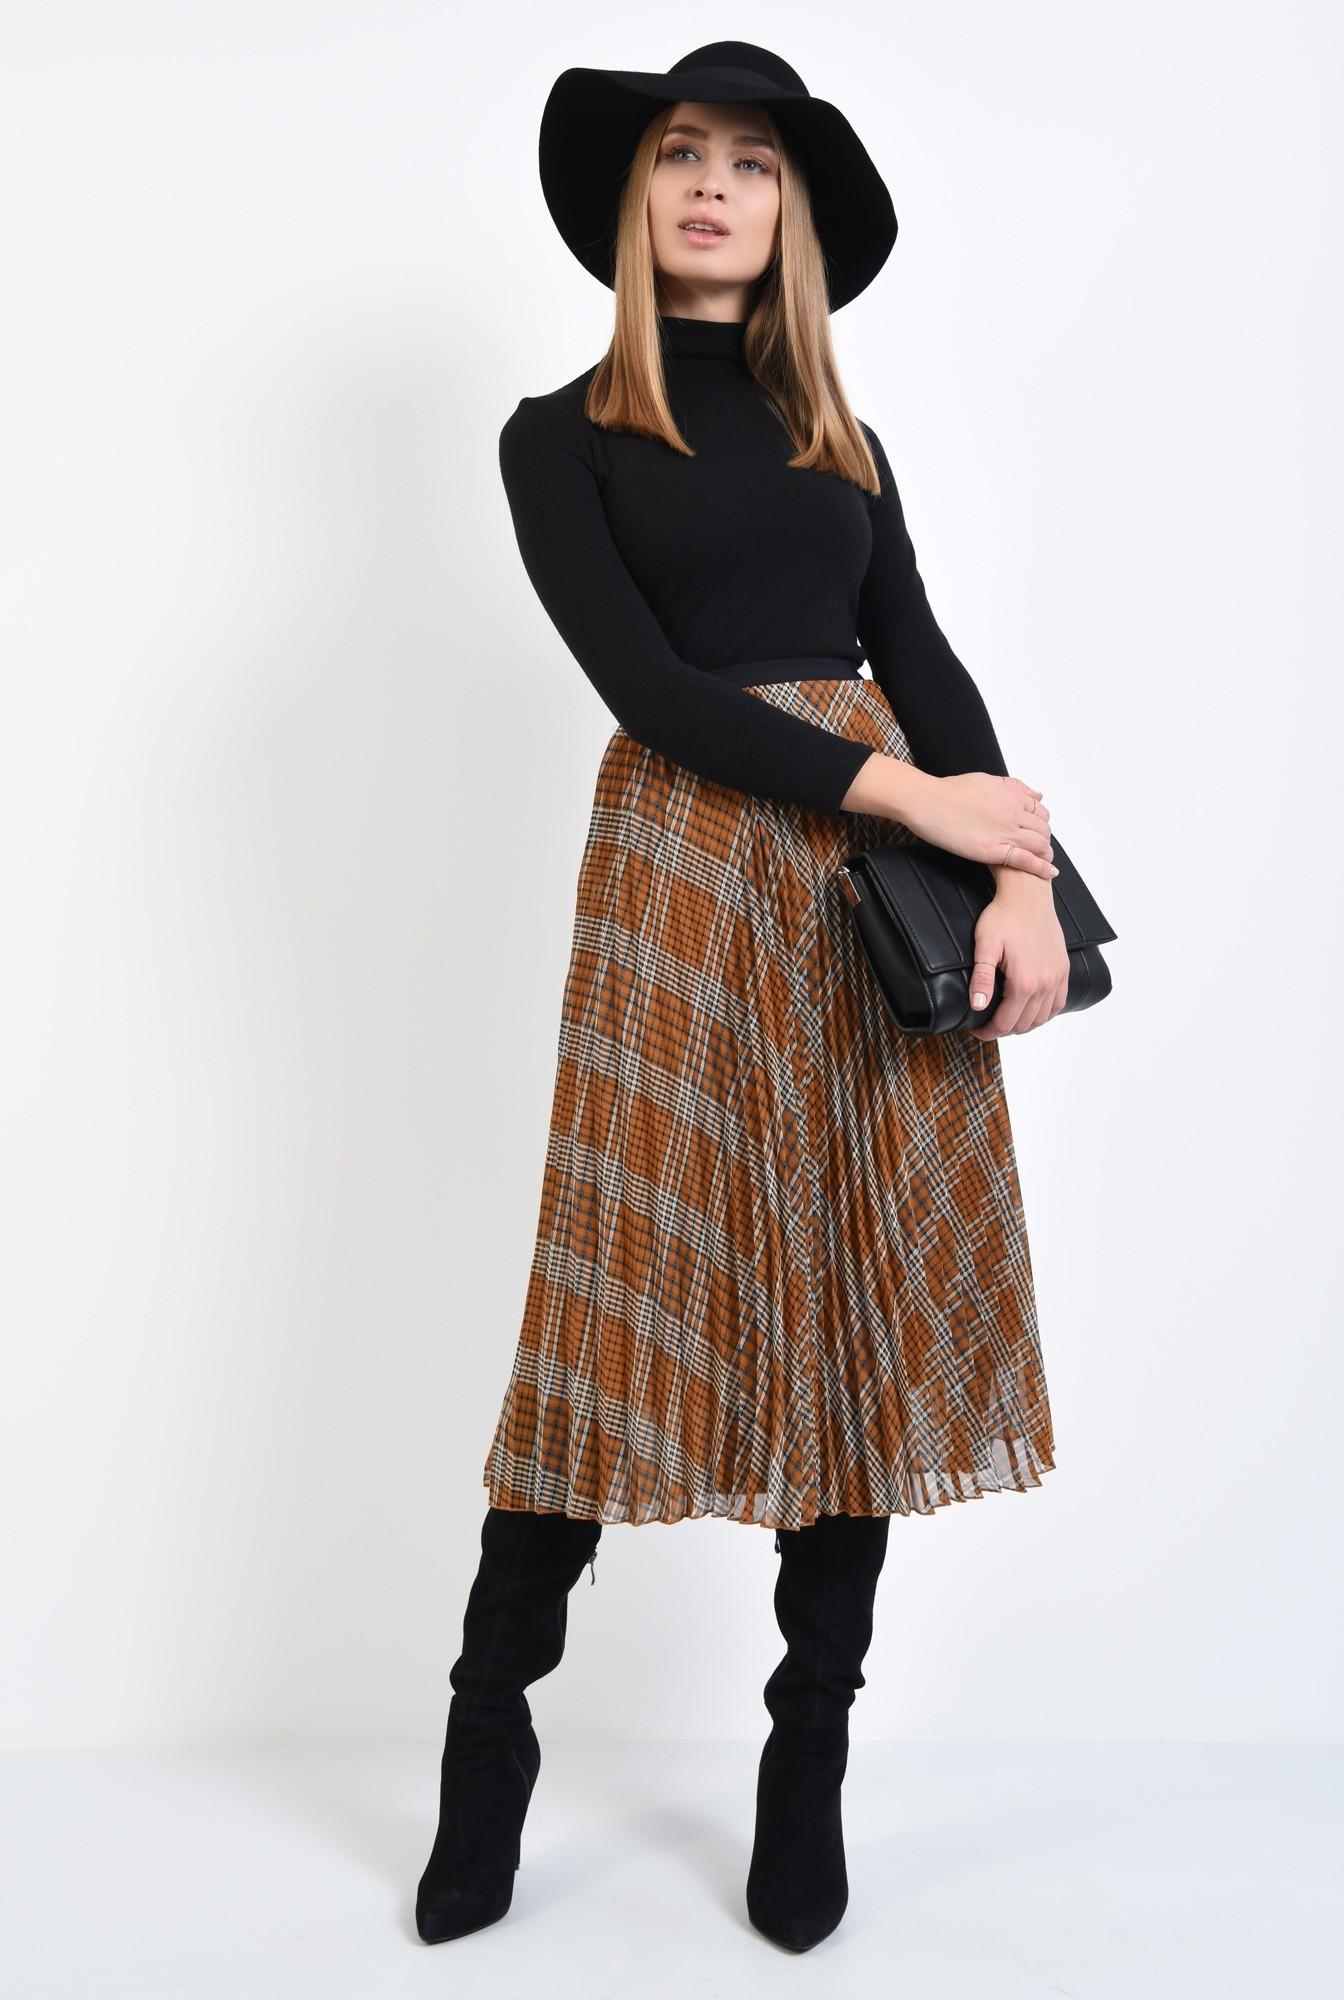 3 - fusta casual, lungime midi, croi evazat, pliseuri inguste, betelie elastica neagra